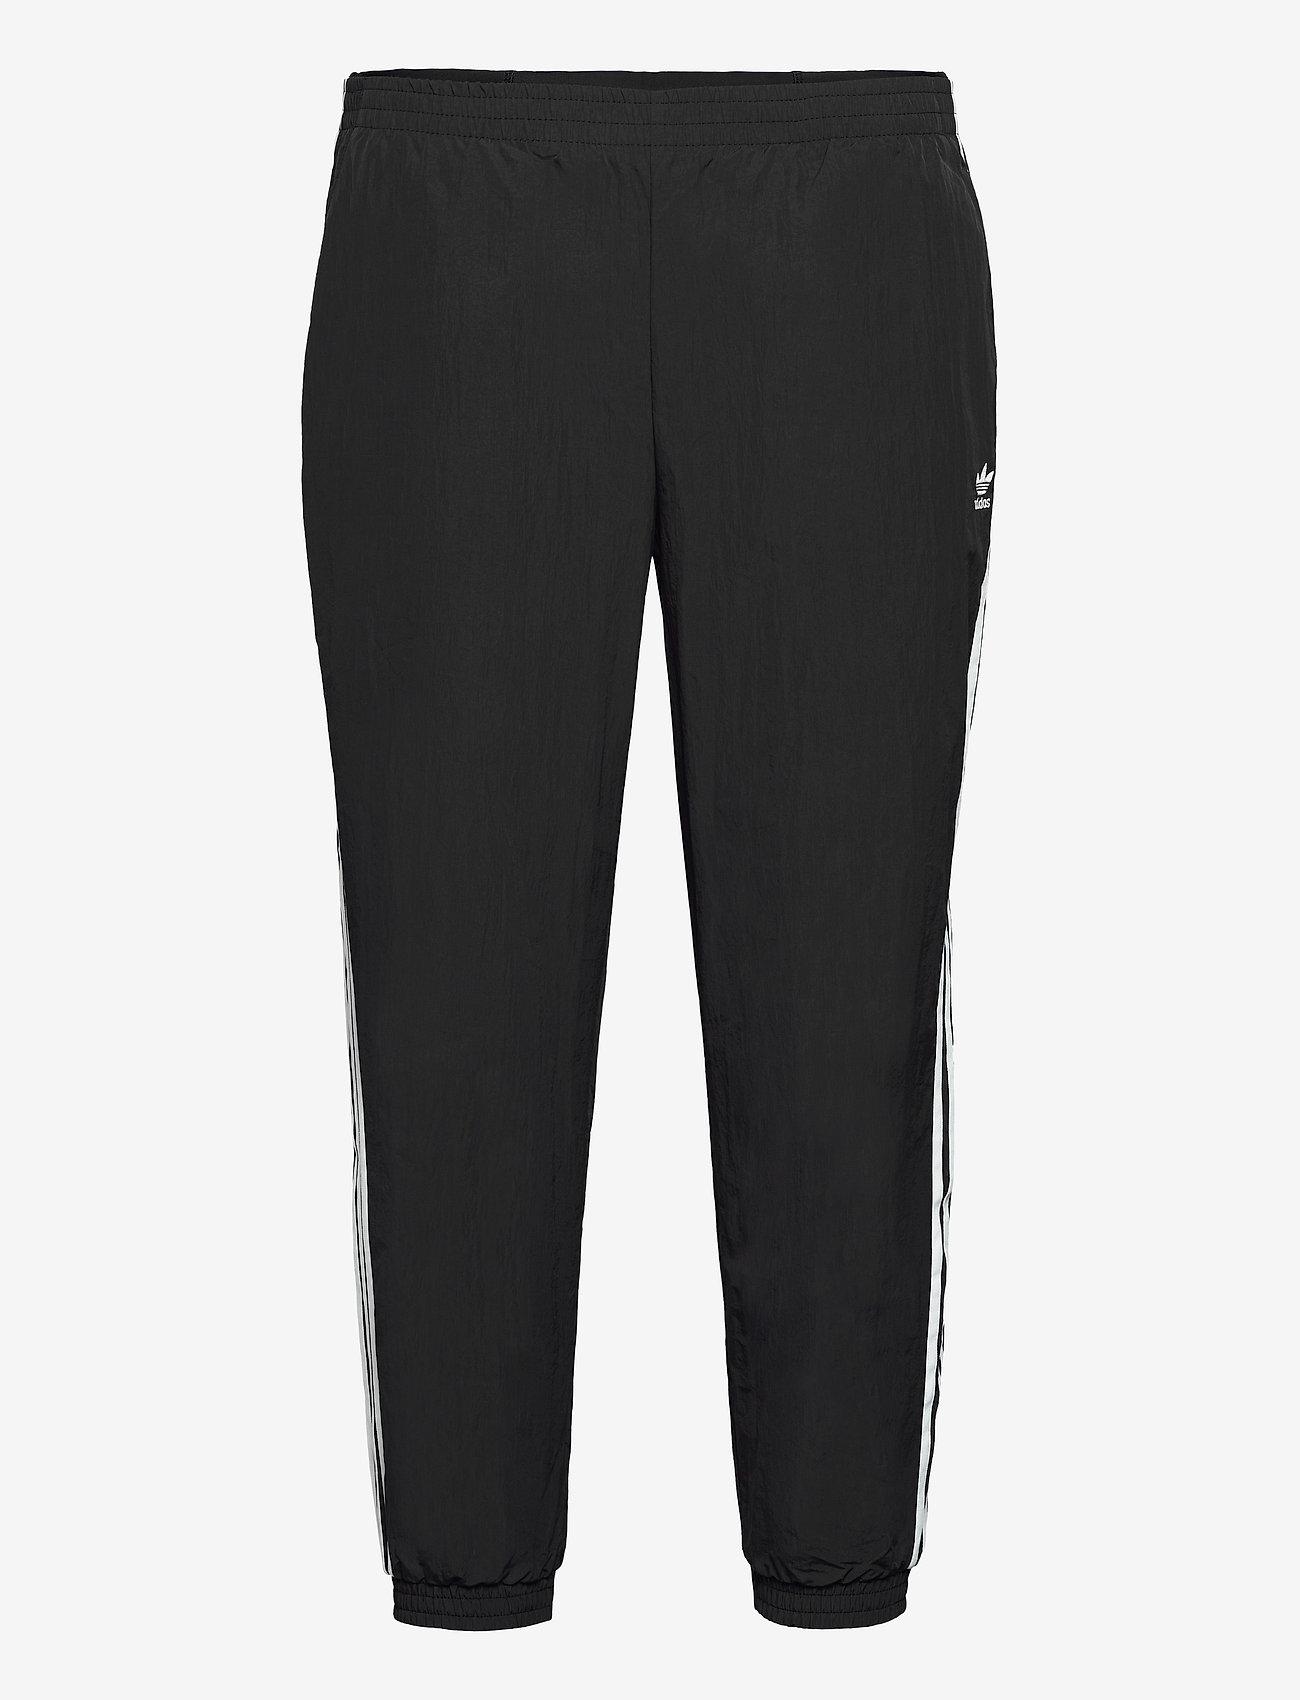 adidas Originals - Adicolor Classics Double-Waistband F Track Pants W (PS) - trainingsbroek - black - 1